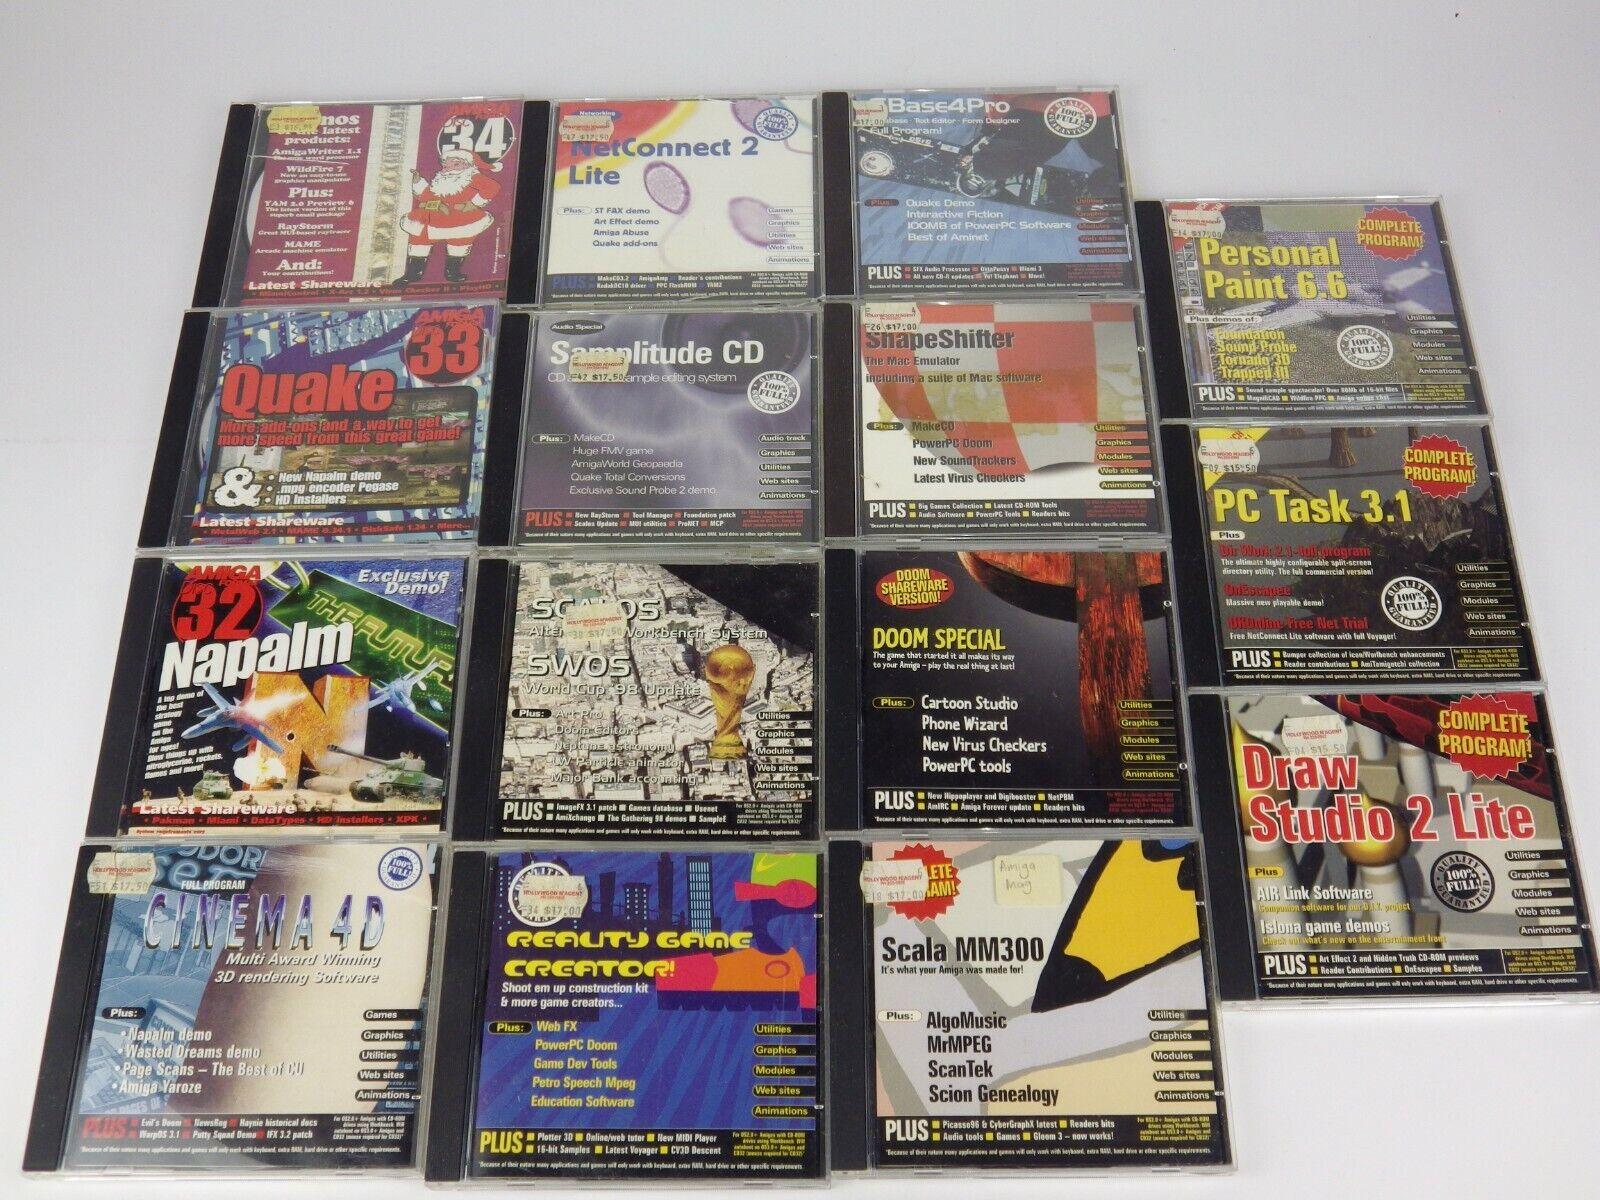 Computer Games - 46 x Commodore Amiga Magazine CD Games & Programs - For Big Box Amiga & CD32